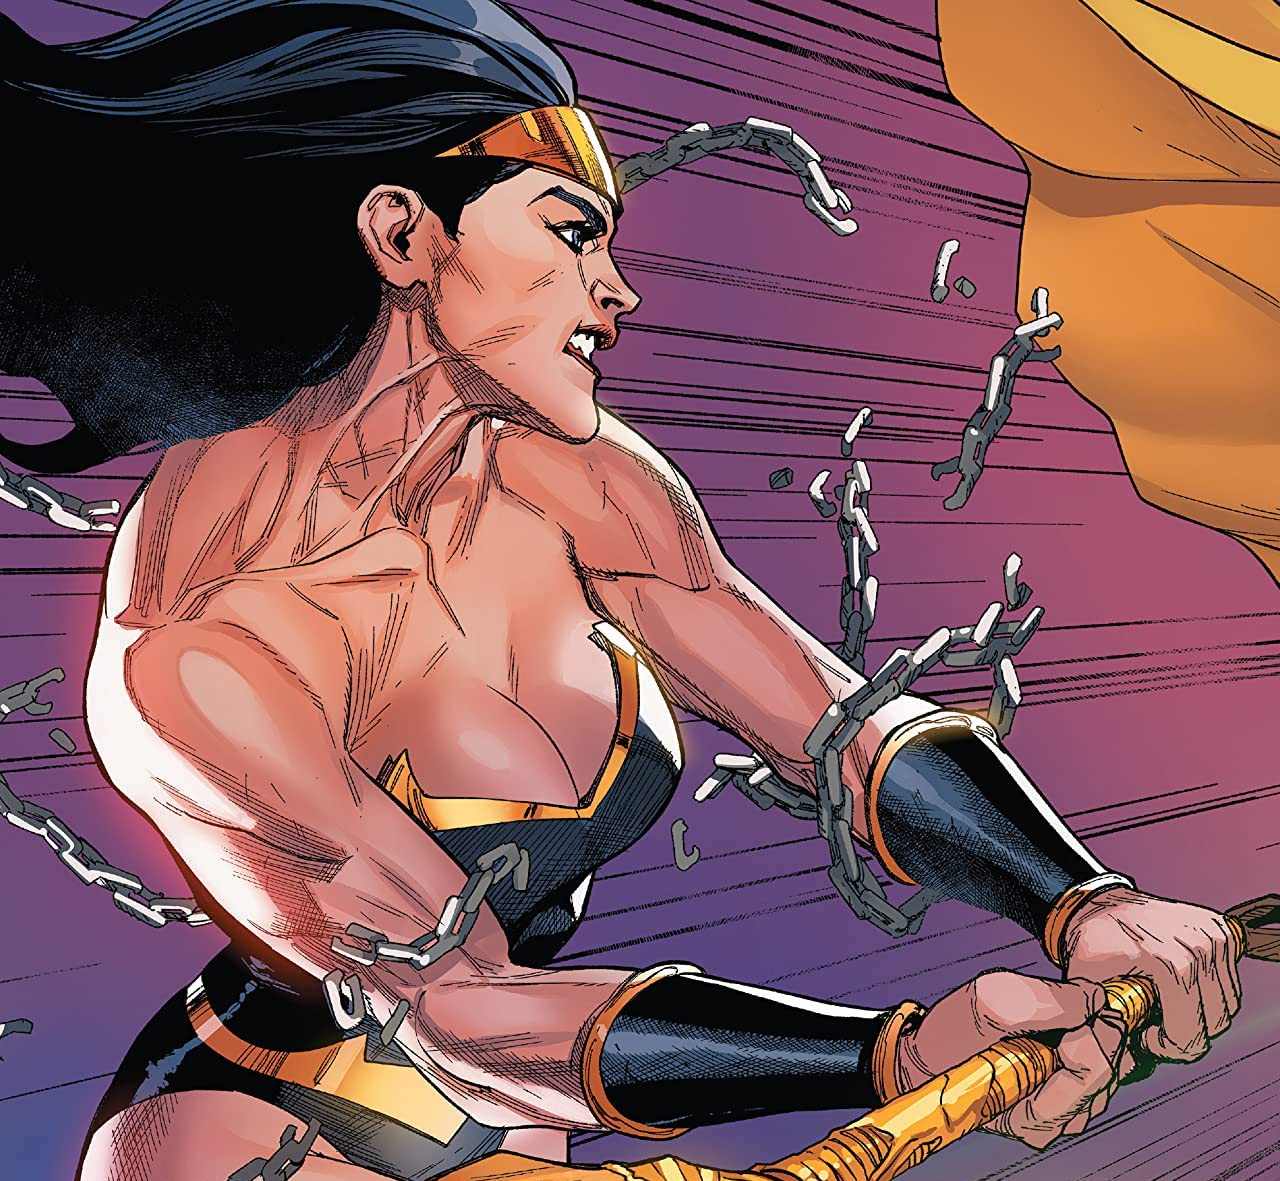 'Heroes Reborn' #6 puts the power in Power Princess